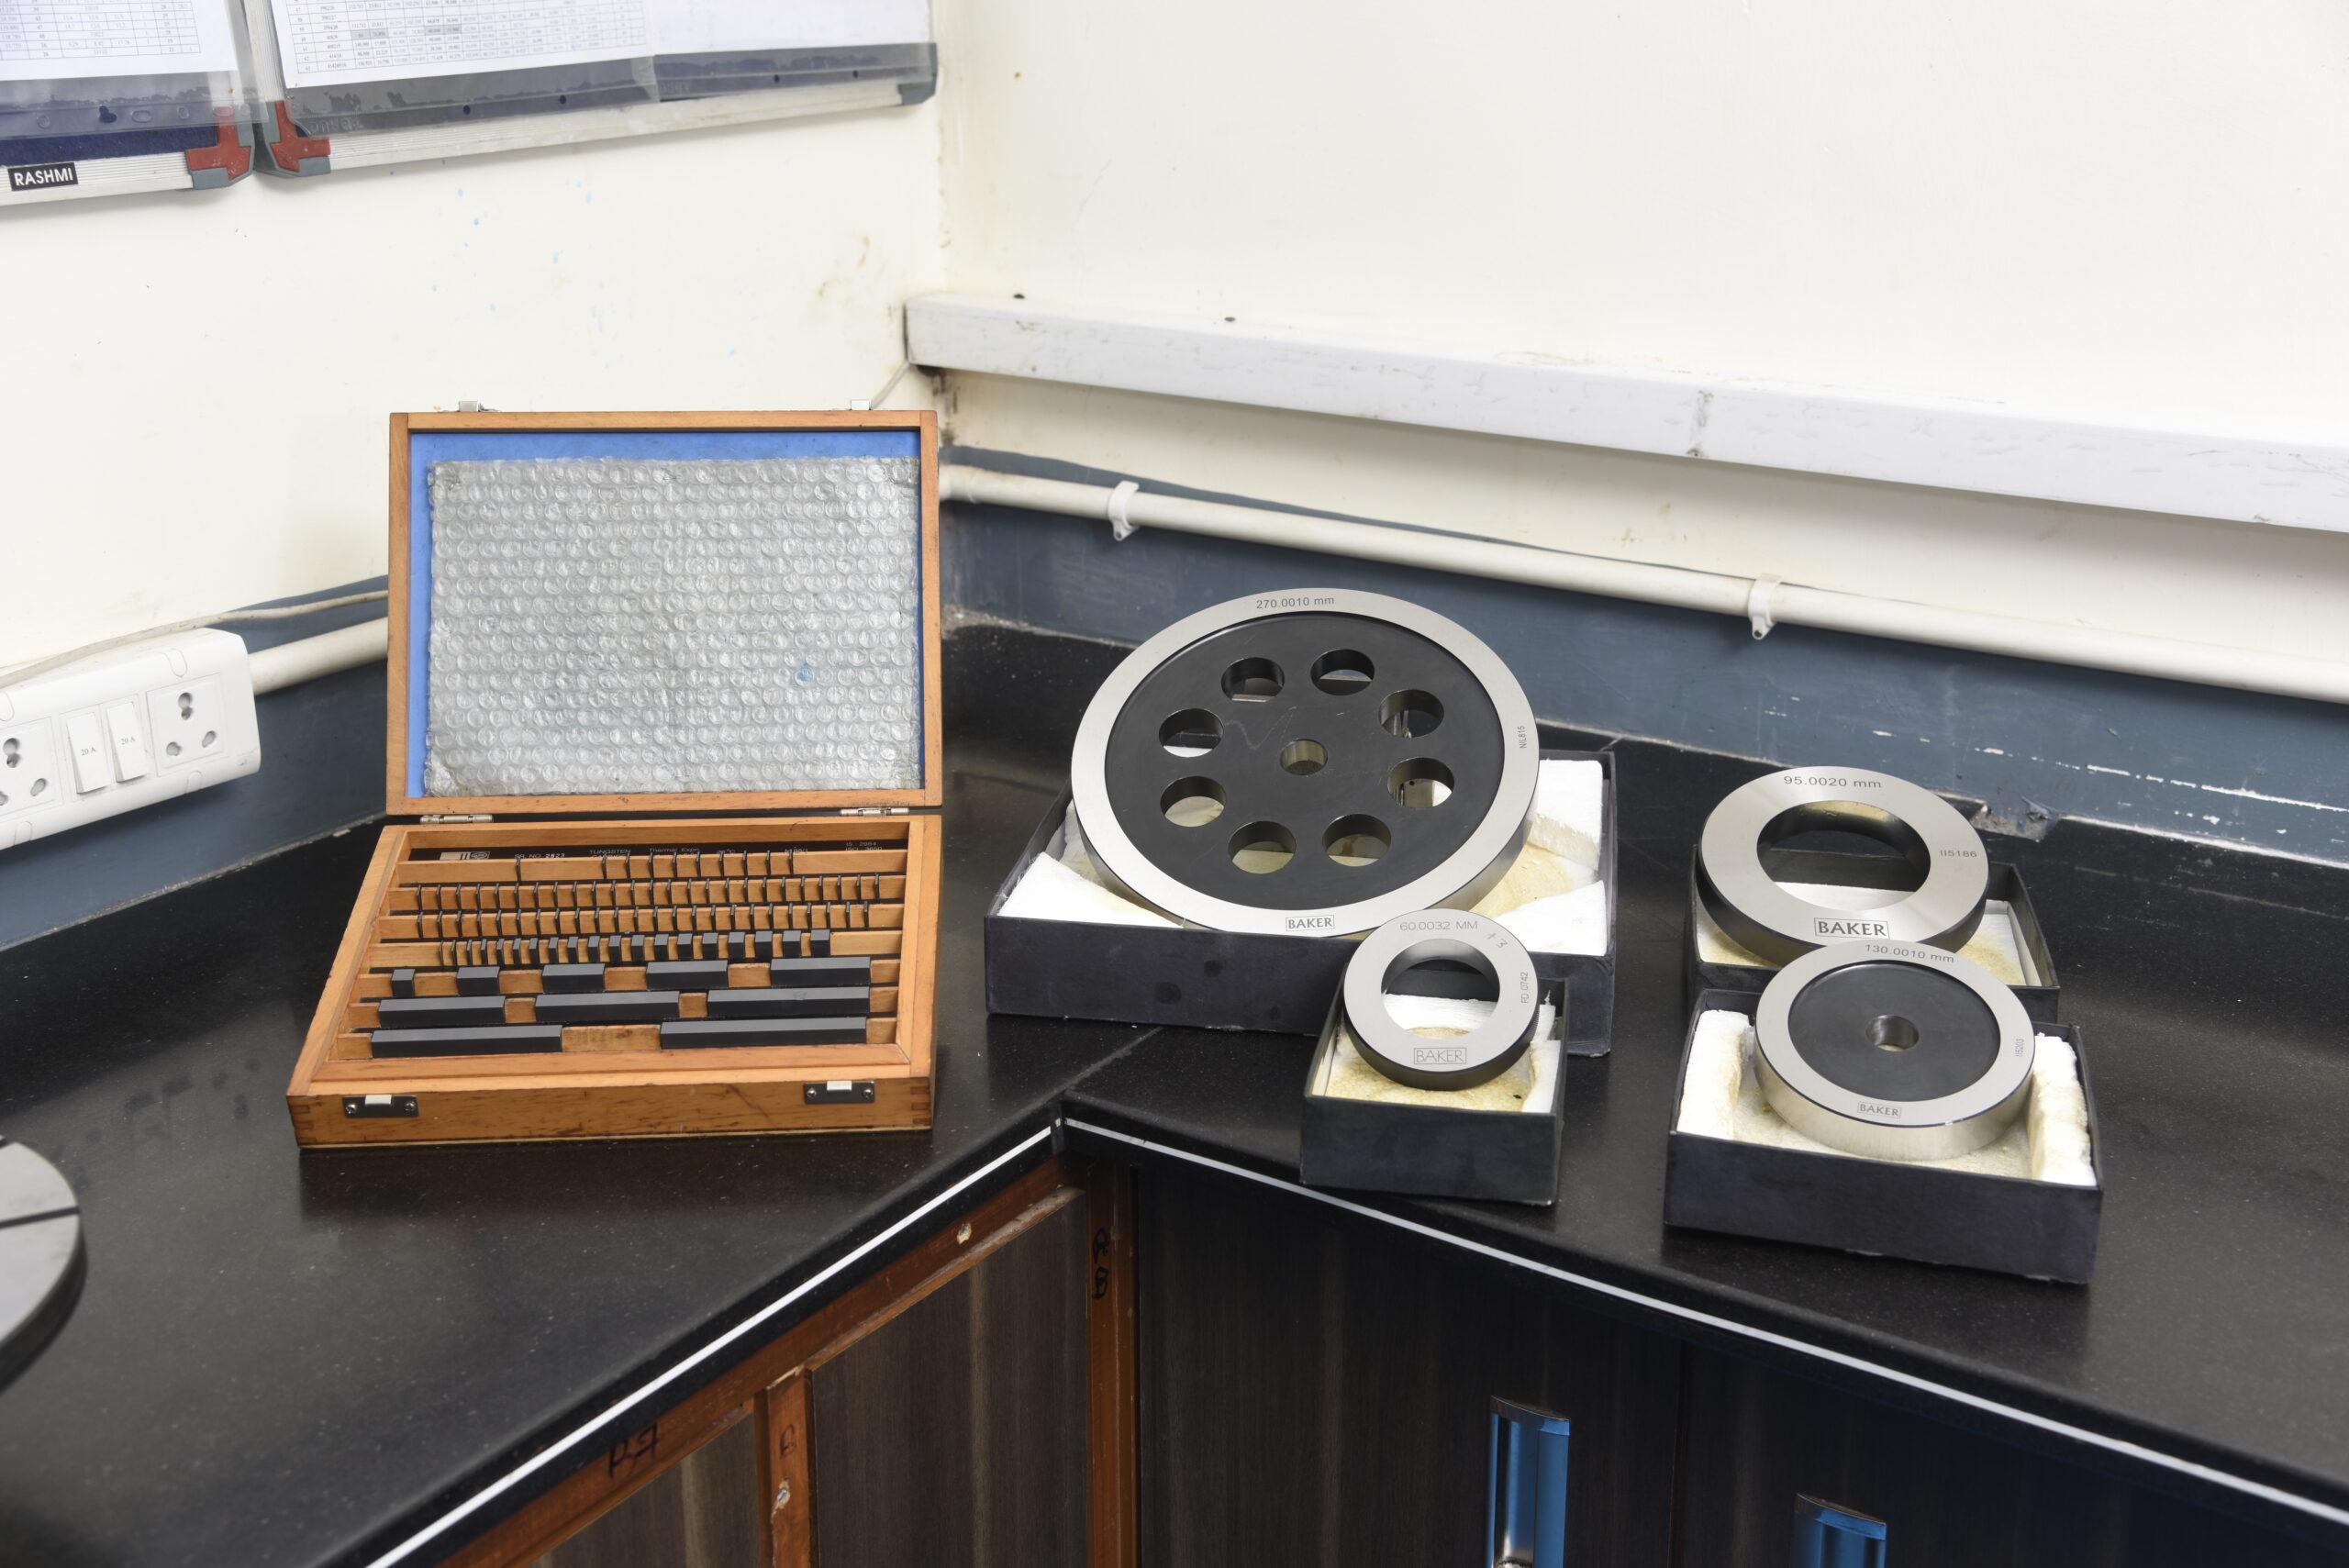 slip Gauge Box - Marc Bearings Pvt. Ltd. - India - Standard - Quality Control Room- Marc Bearings Pvt. Ltd. - India